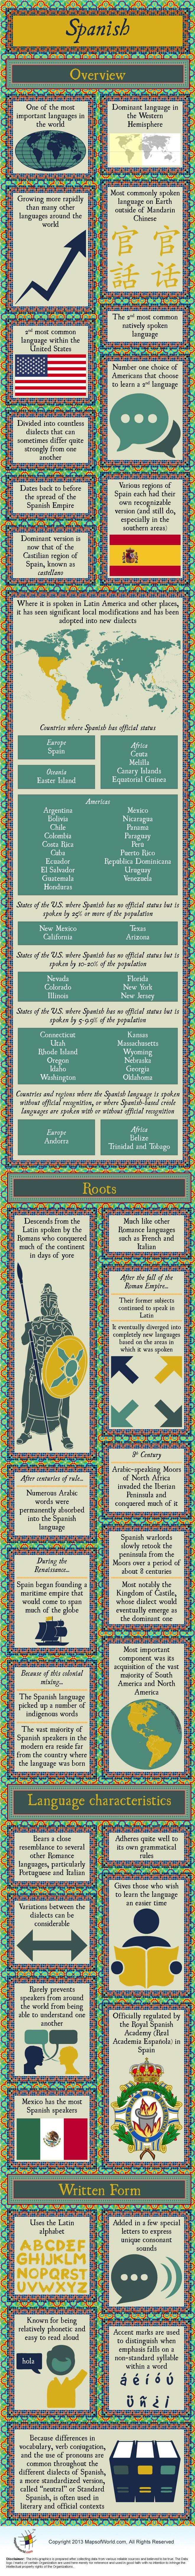 Infographic of Spanish Language